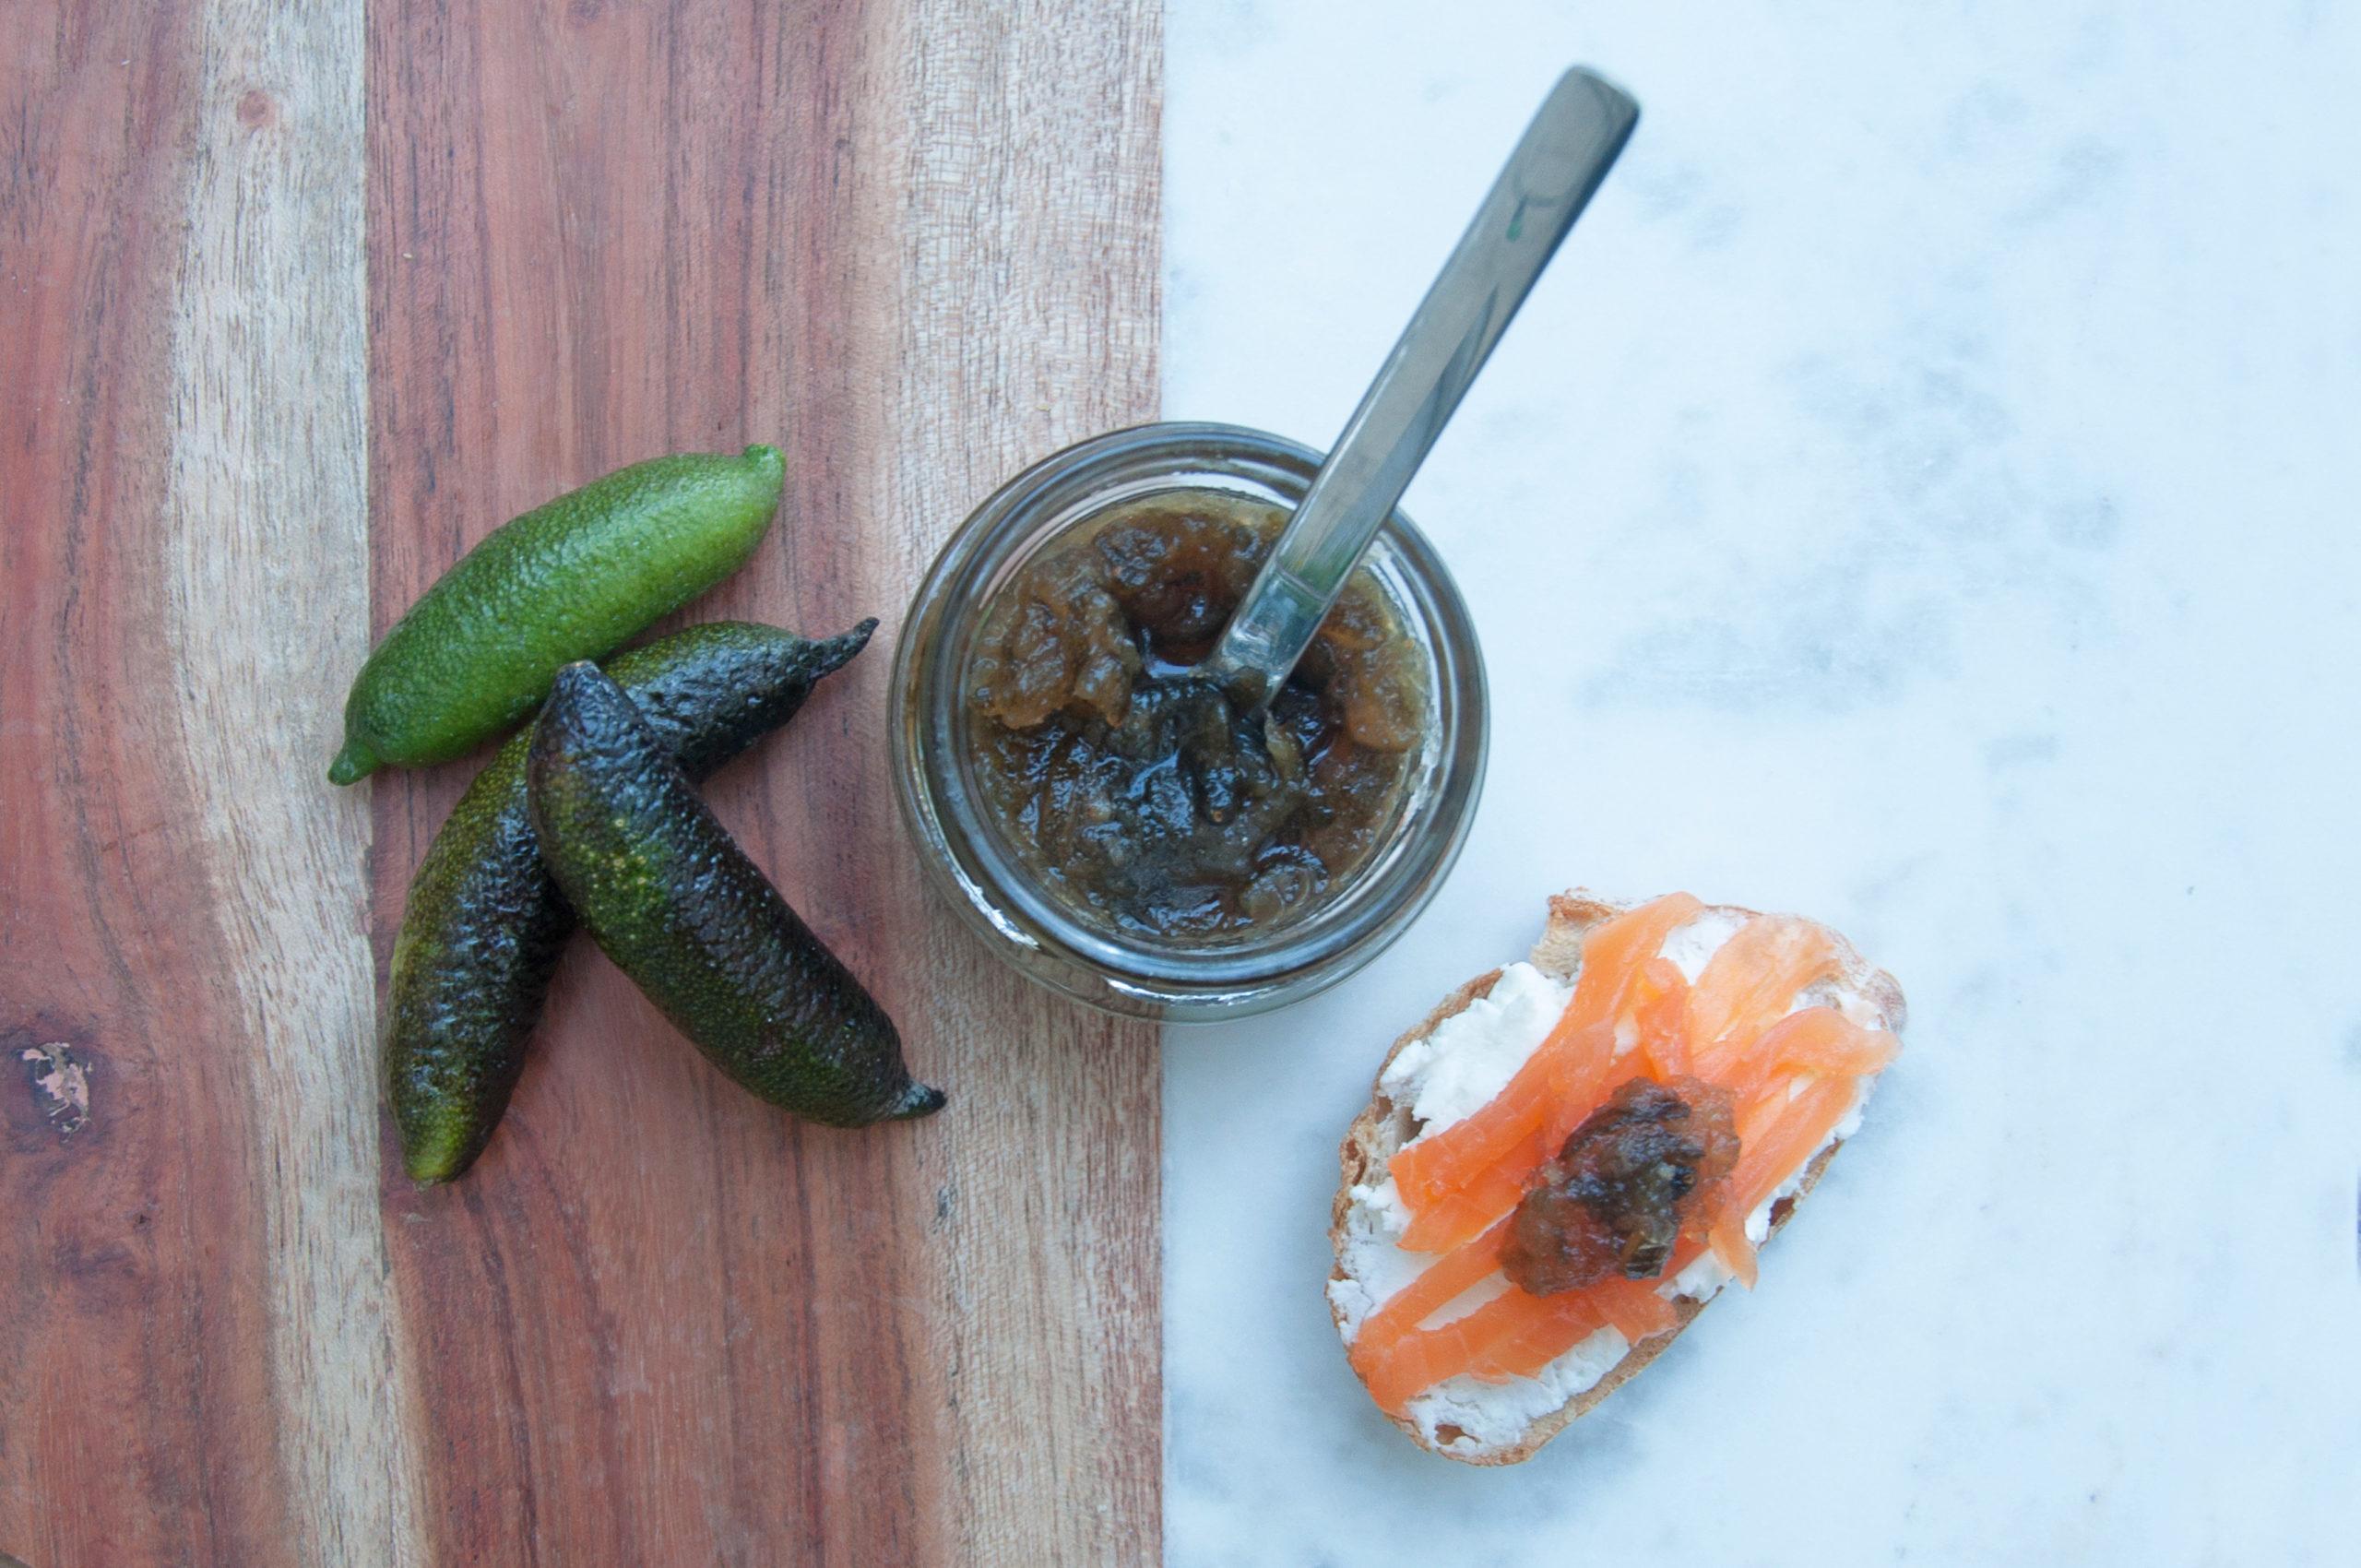 marmalade_citron_caviar_fruits_at_home